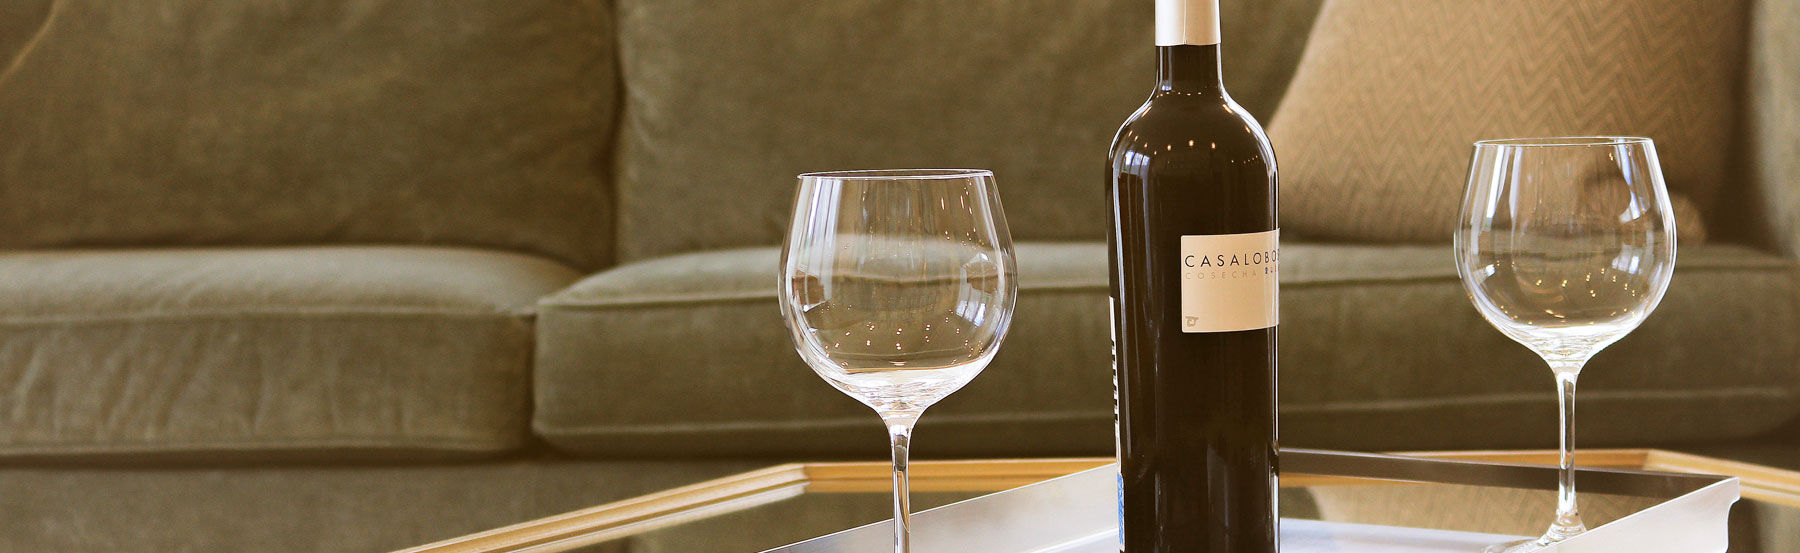 WEBIMAGES: Sept2019-Couch-Wine.jpg